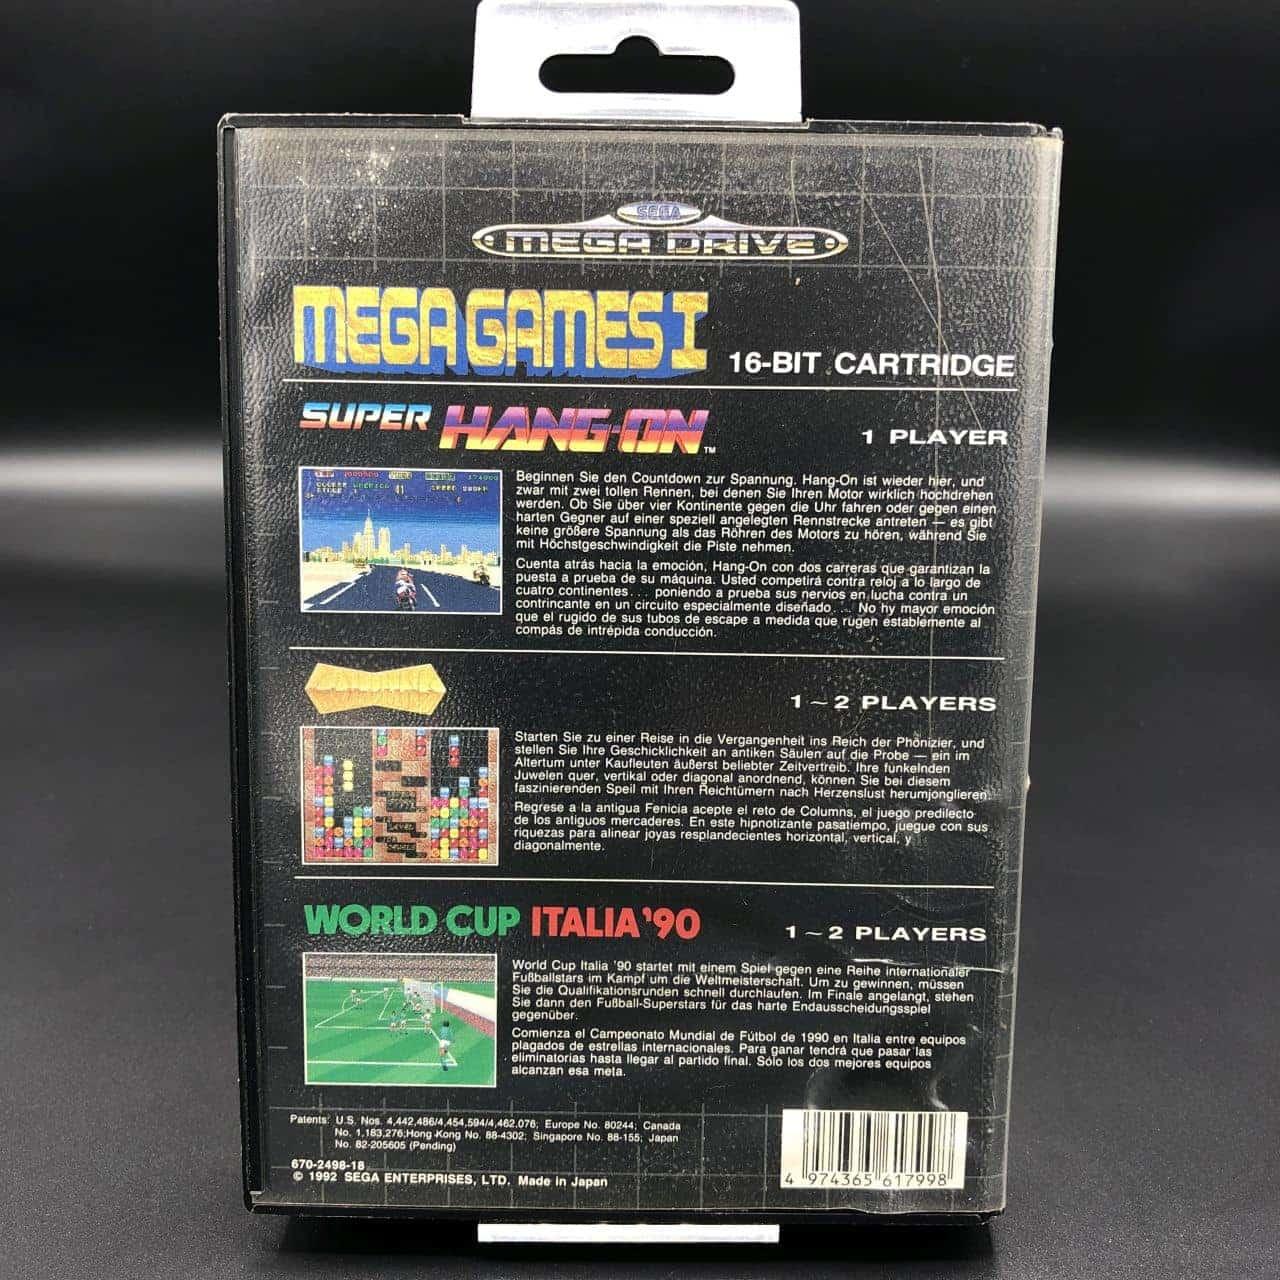 Mega Games 1 (ohne Anleitung) (Gut) Sega Mega Drive